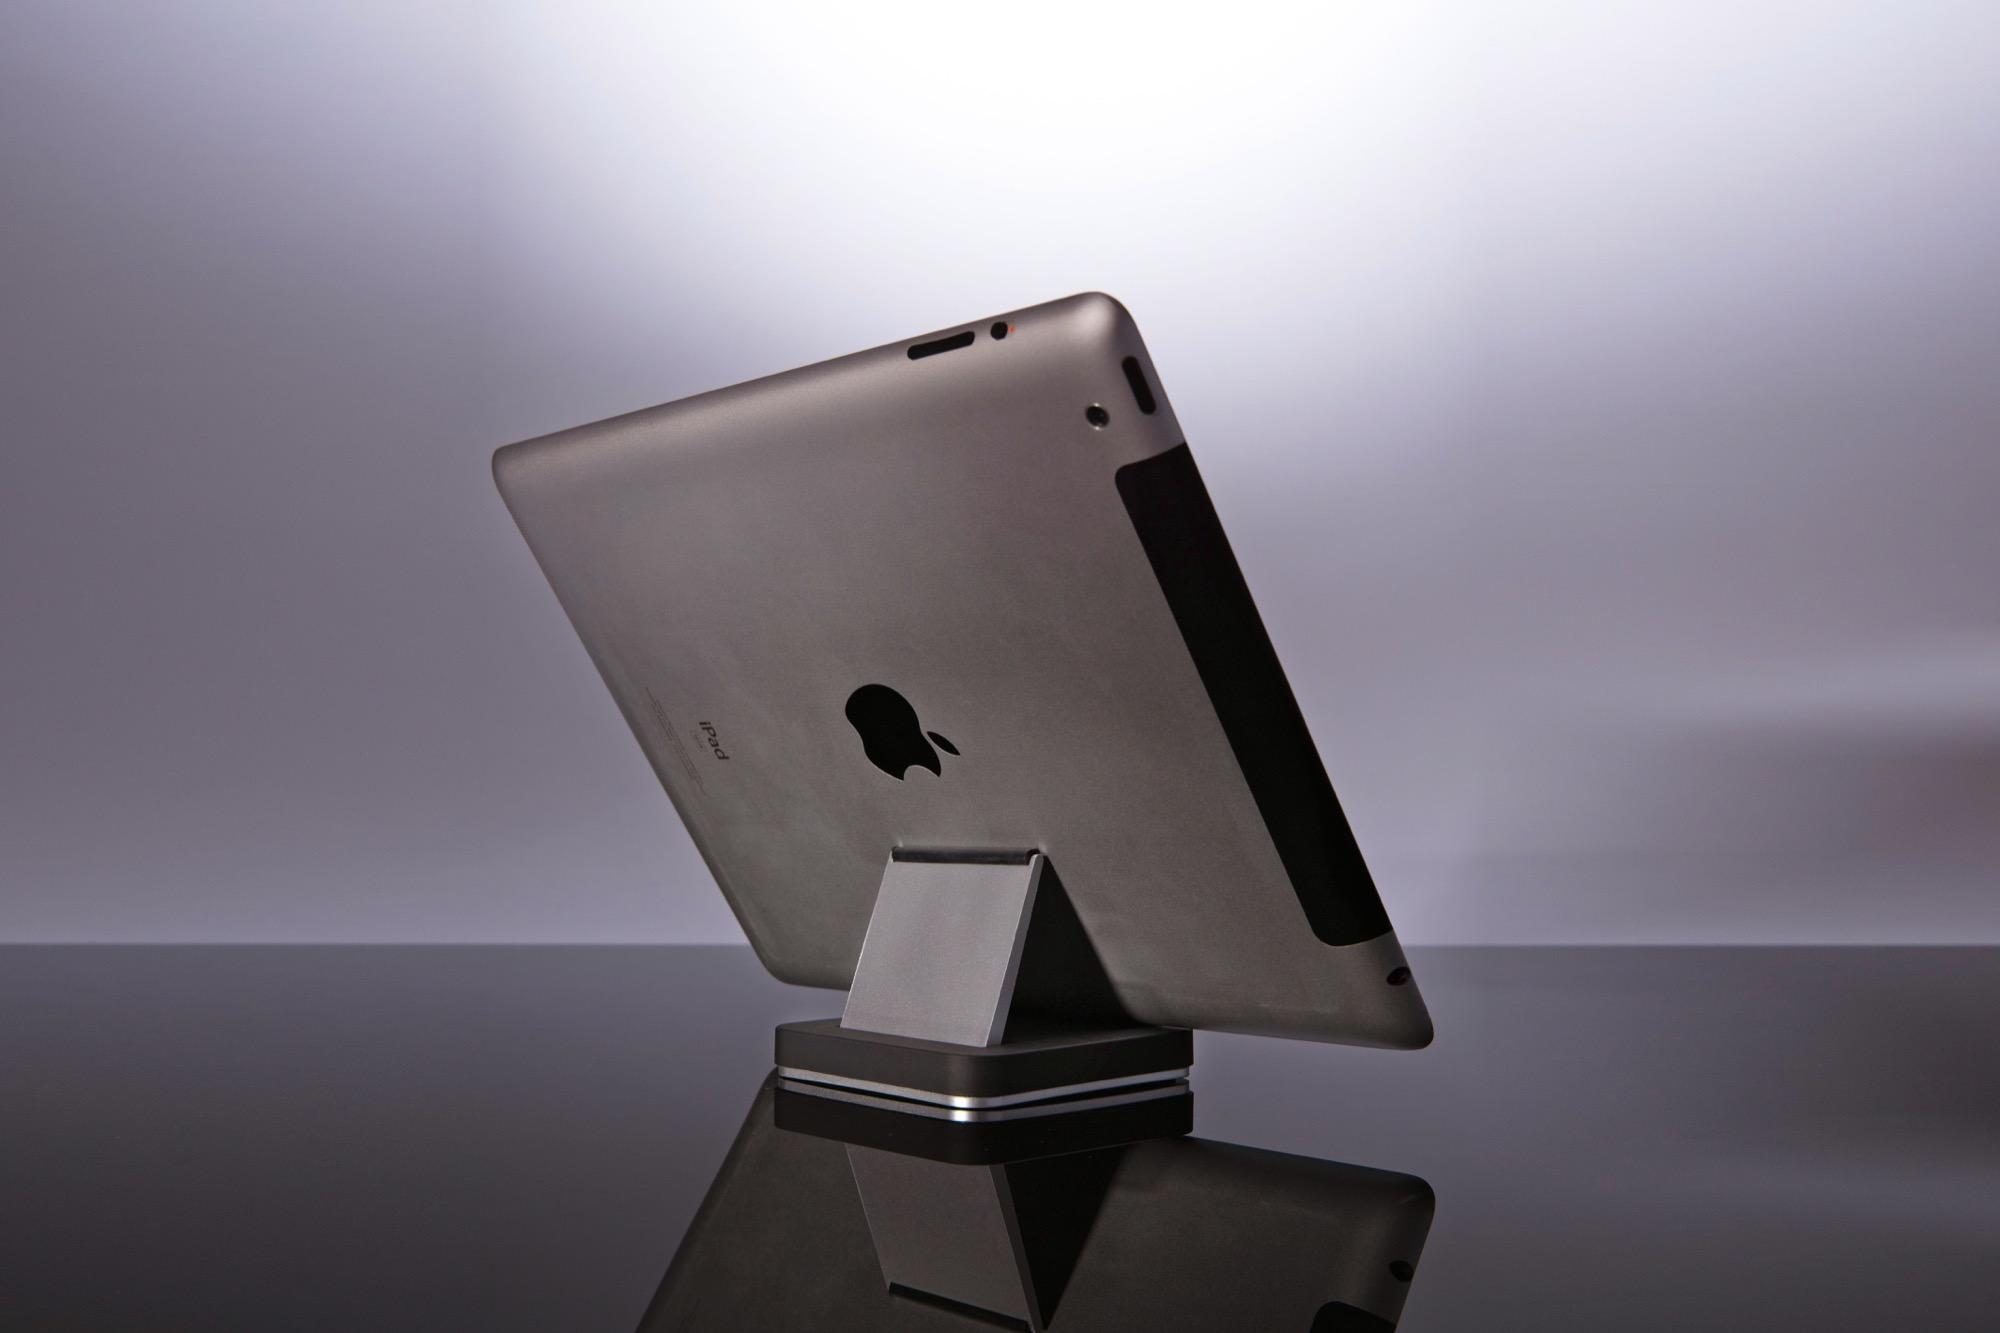 S2 Tablet & XL Phone Dock